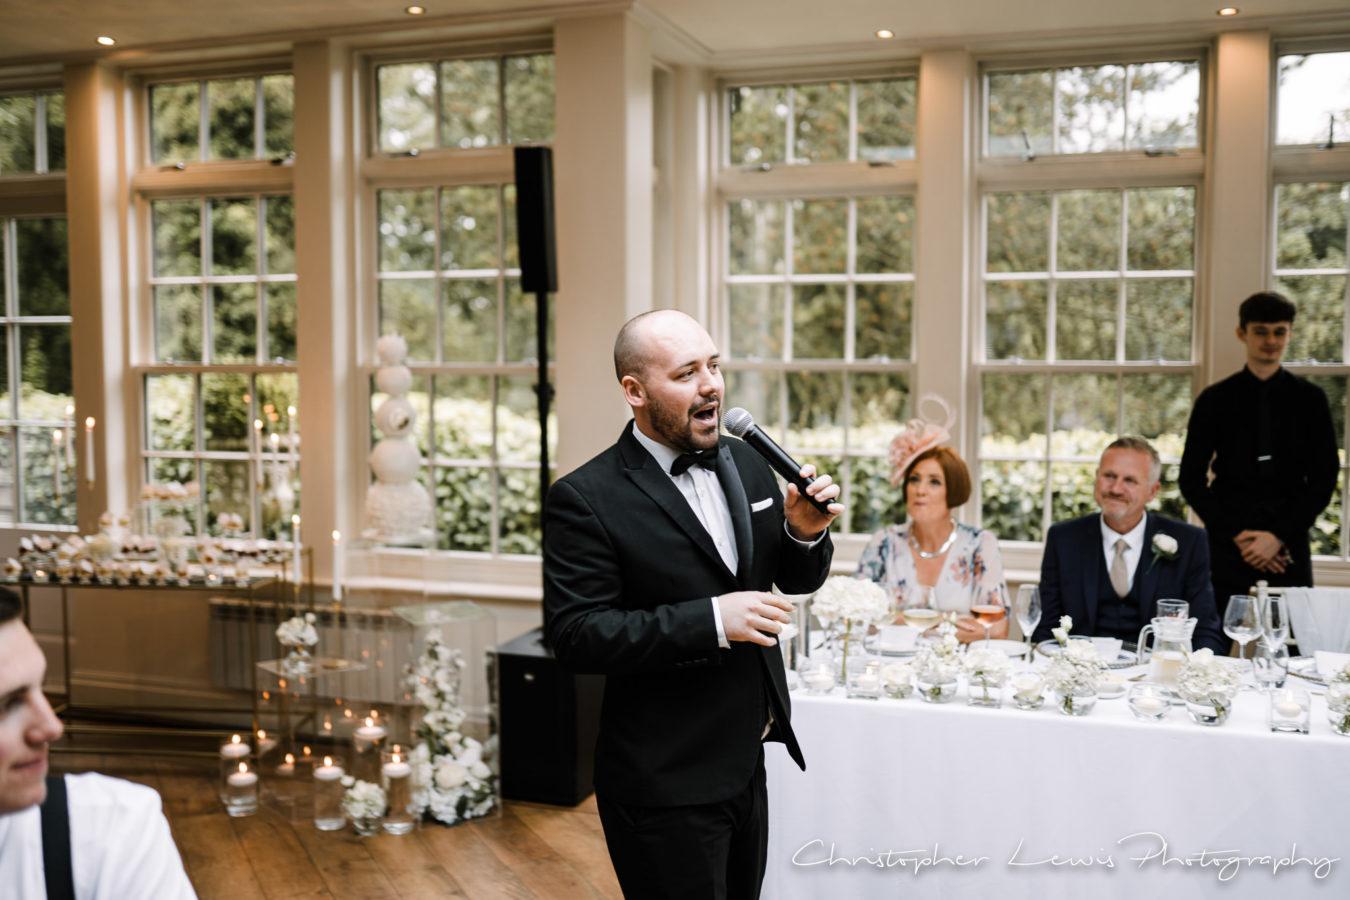 Mitton-Hall-Wedding 39